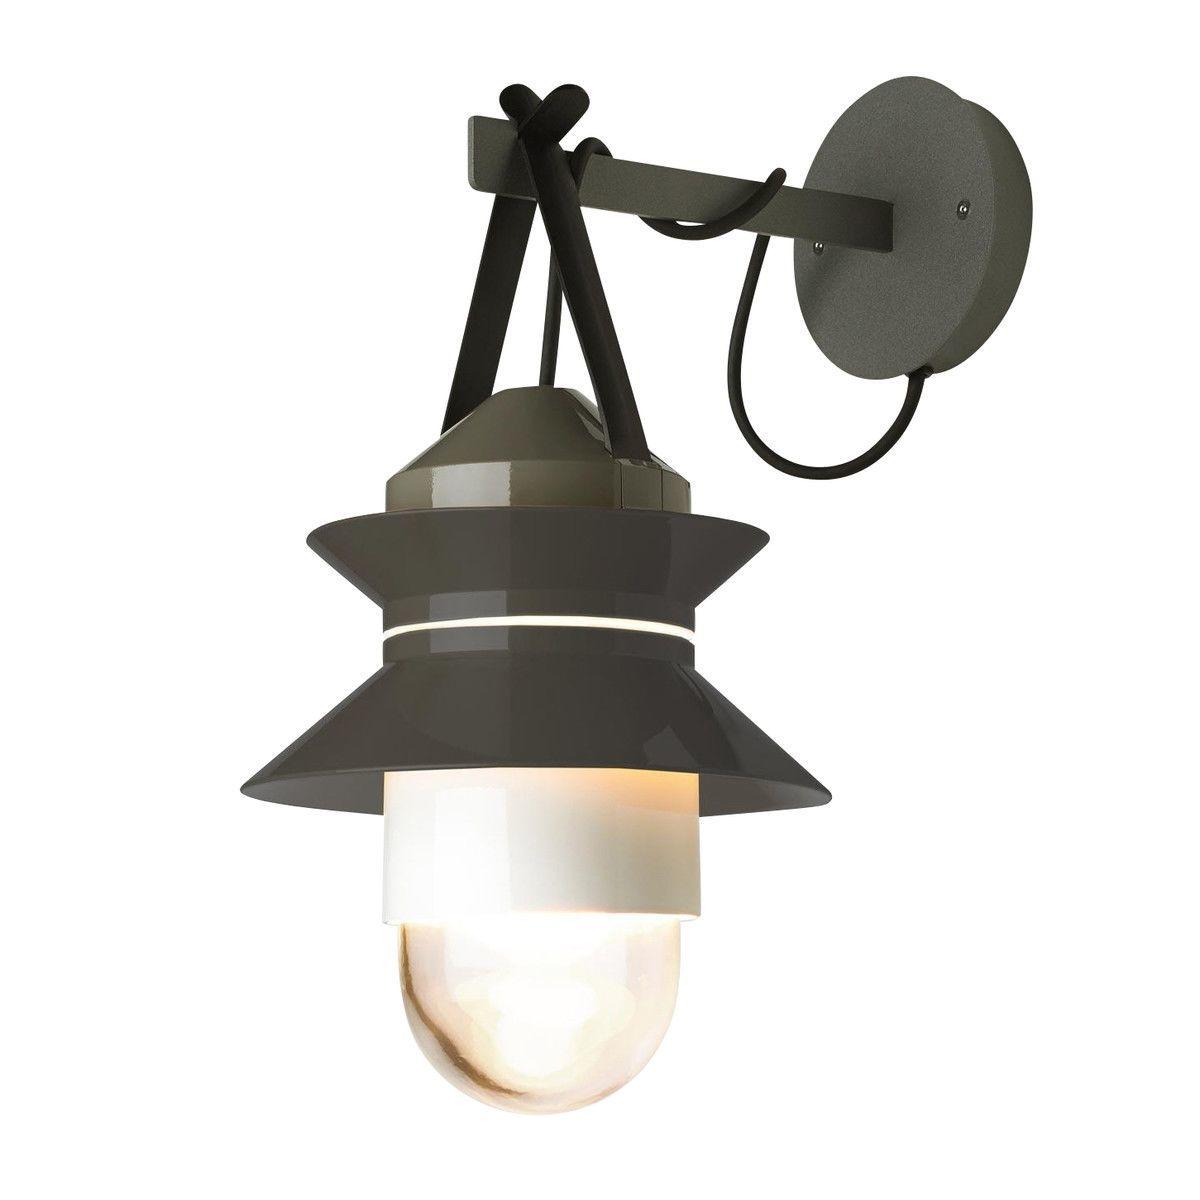 santorini outdoor wandlamp marset. Black Bedroom Furniture Sets. Home Design Ideas